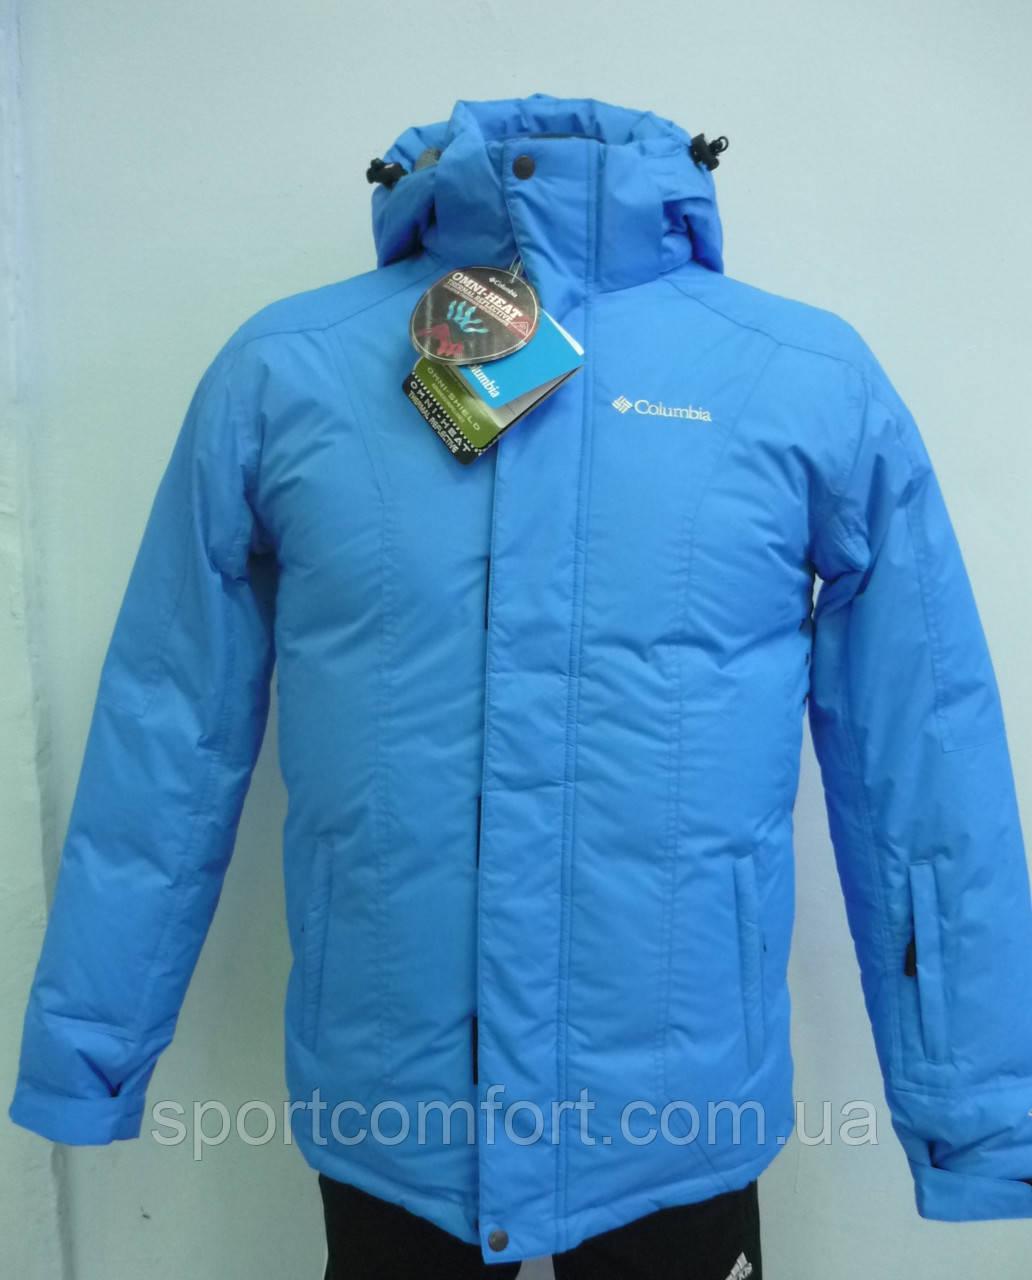 16c9f1cb36cf Пуховик Columbia мужской голубой 923, цена 2 190 грн., купить в ...